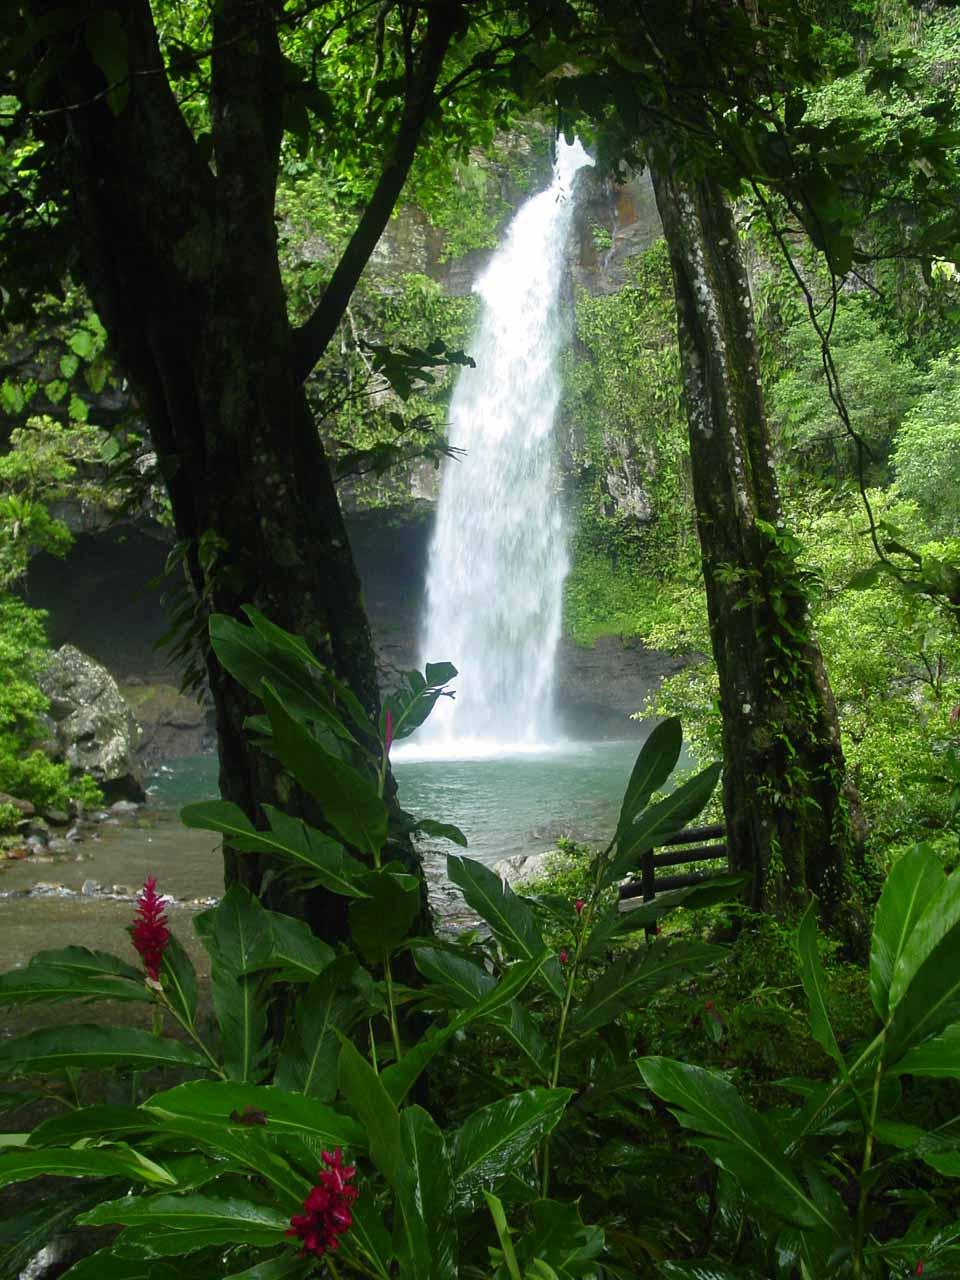 At the Lower Tavoro Falls